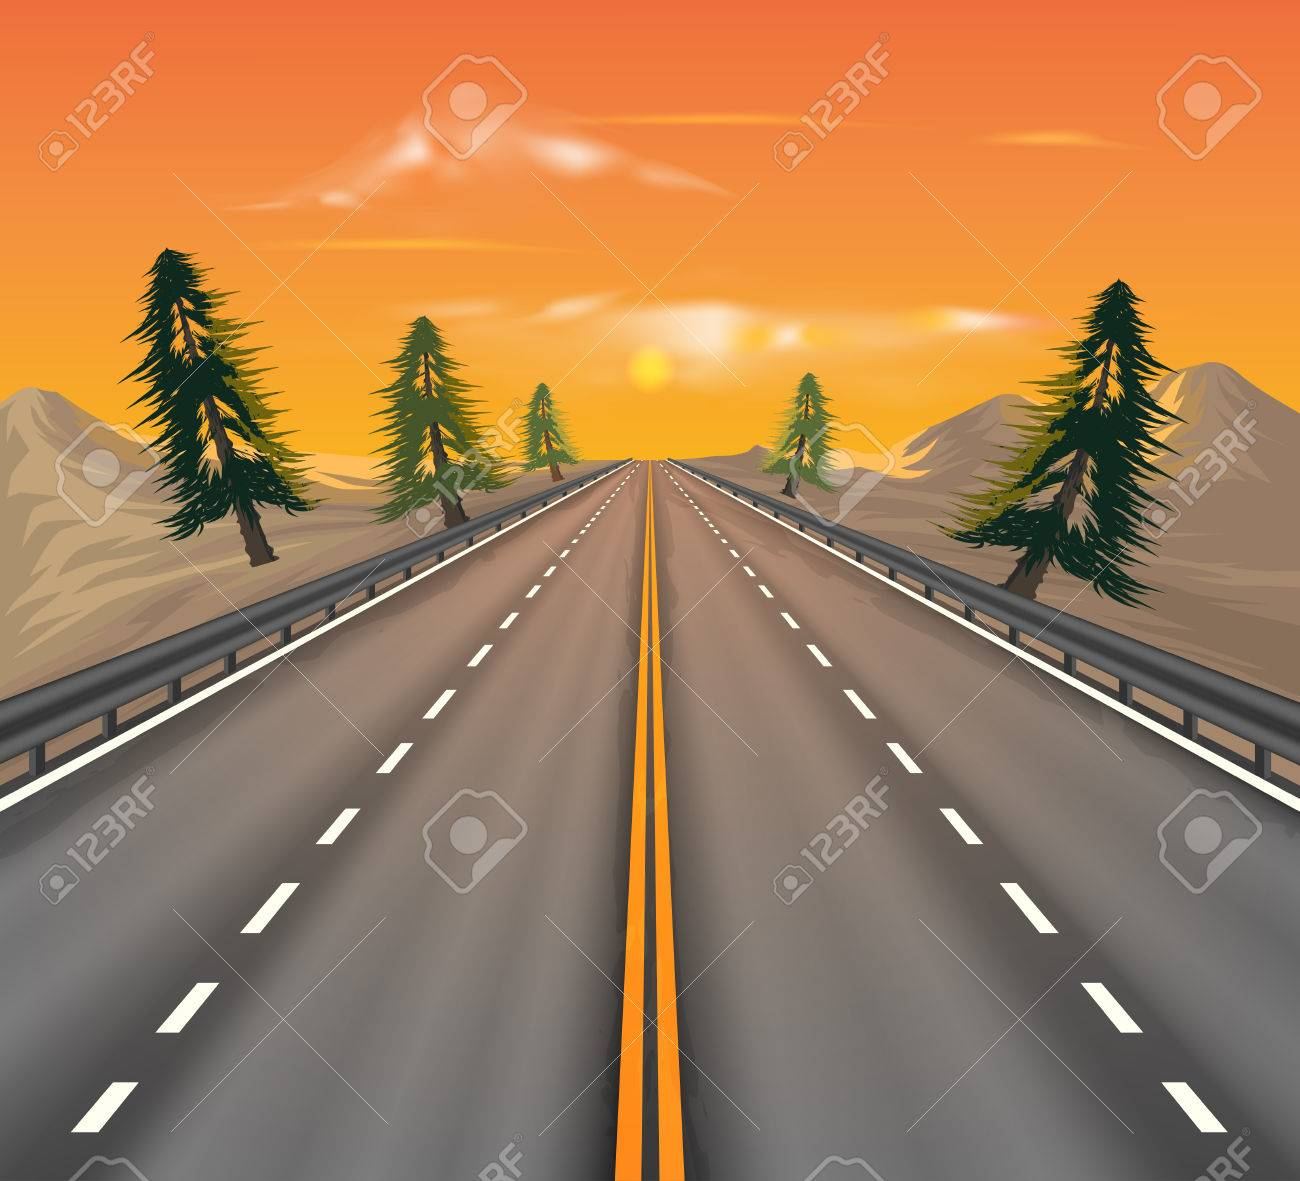 Sunset on the road transportation vector nature landscape background Stock Vector - 59736767